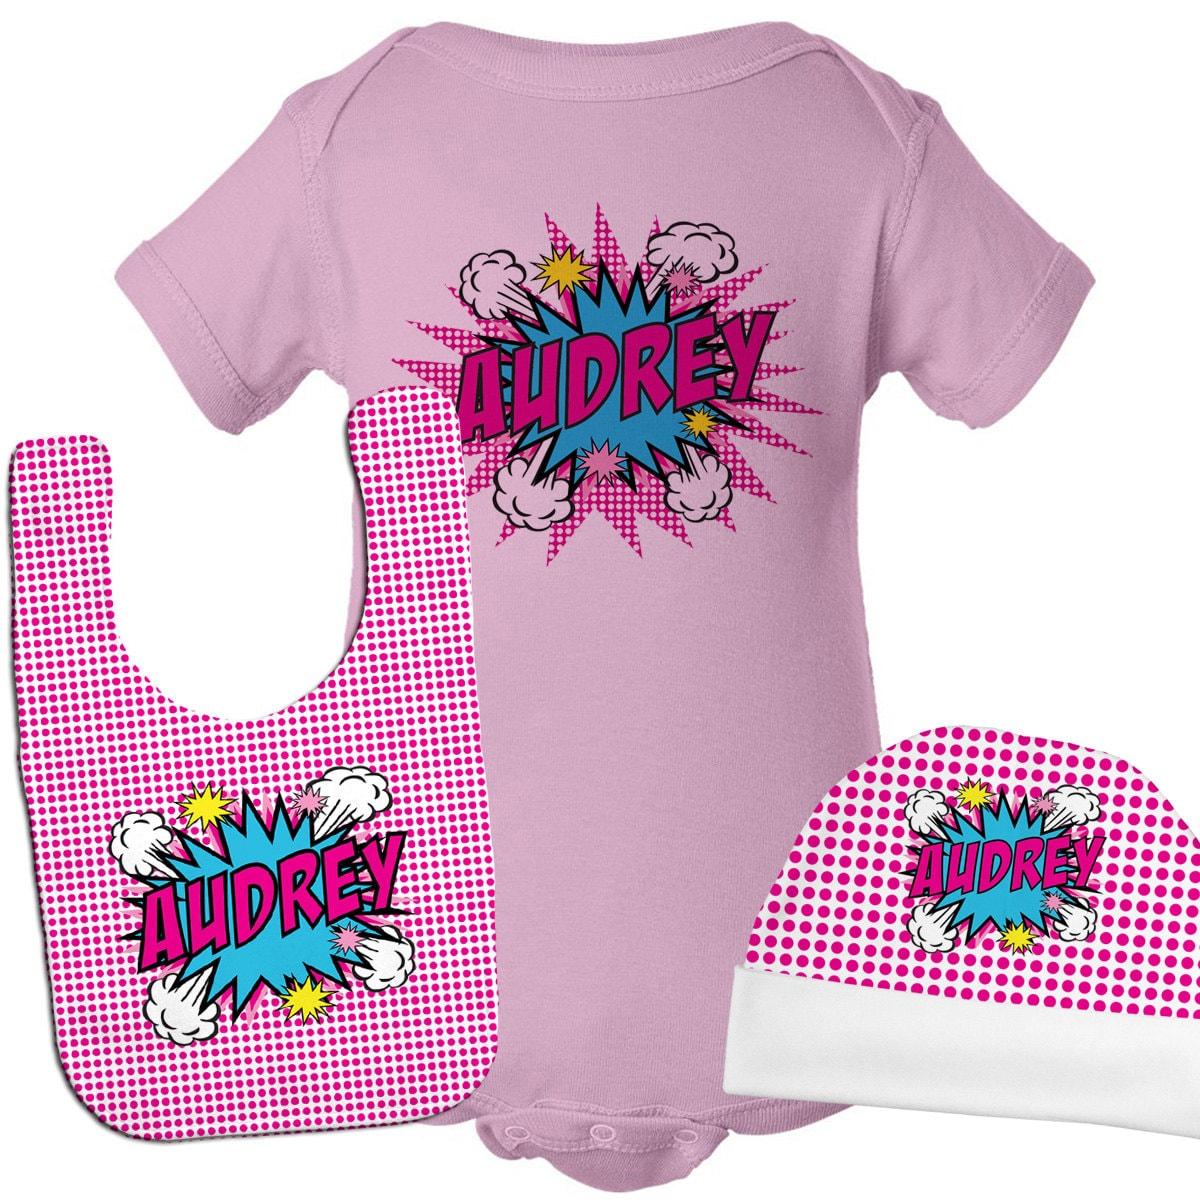 Personalized Baby Gift Sets : Personalized baby gift set superhero girl newborn